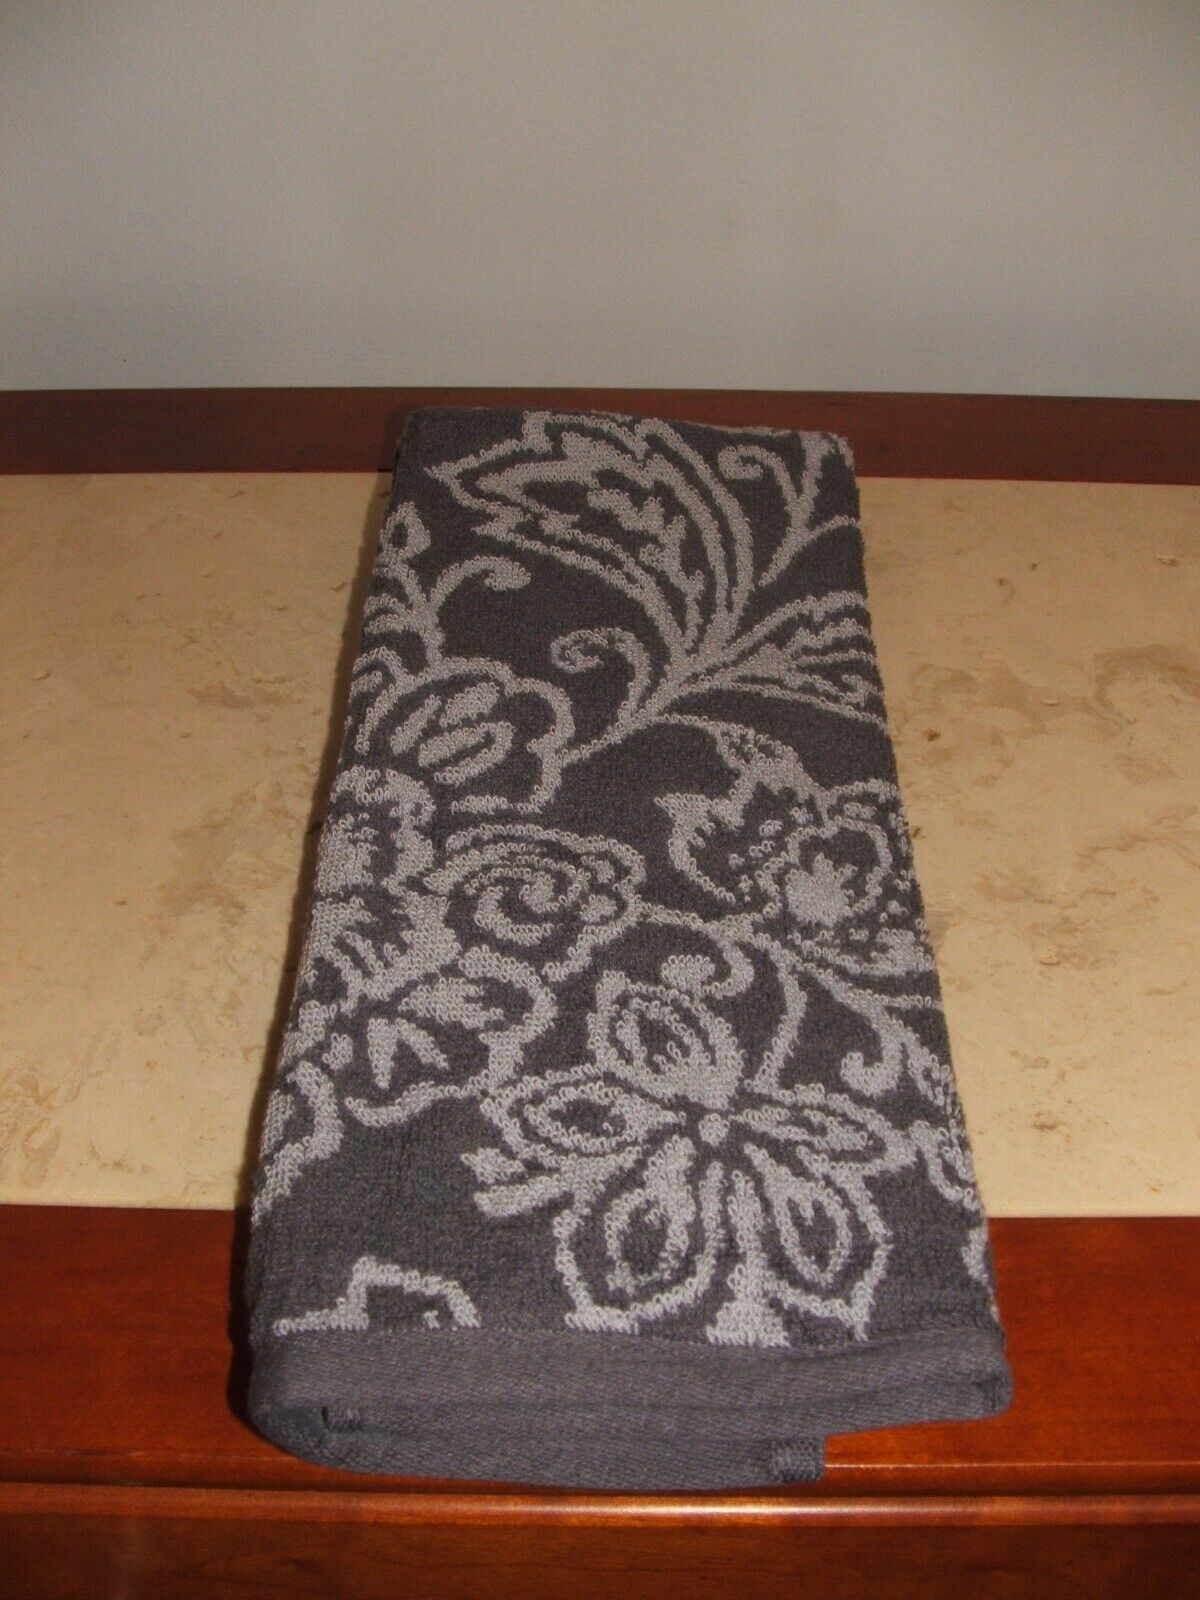 NWT $16 liz claiborne jaquard winter hand Towel  Towels Luxu